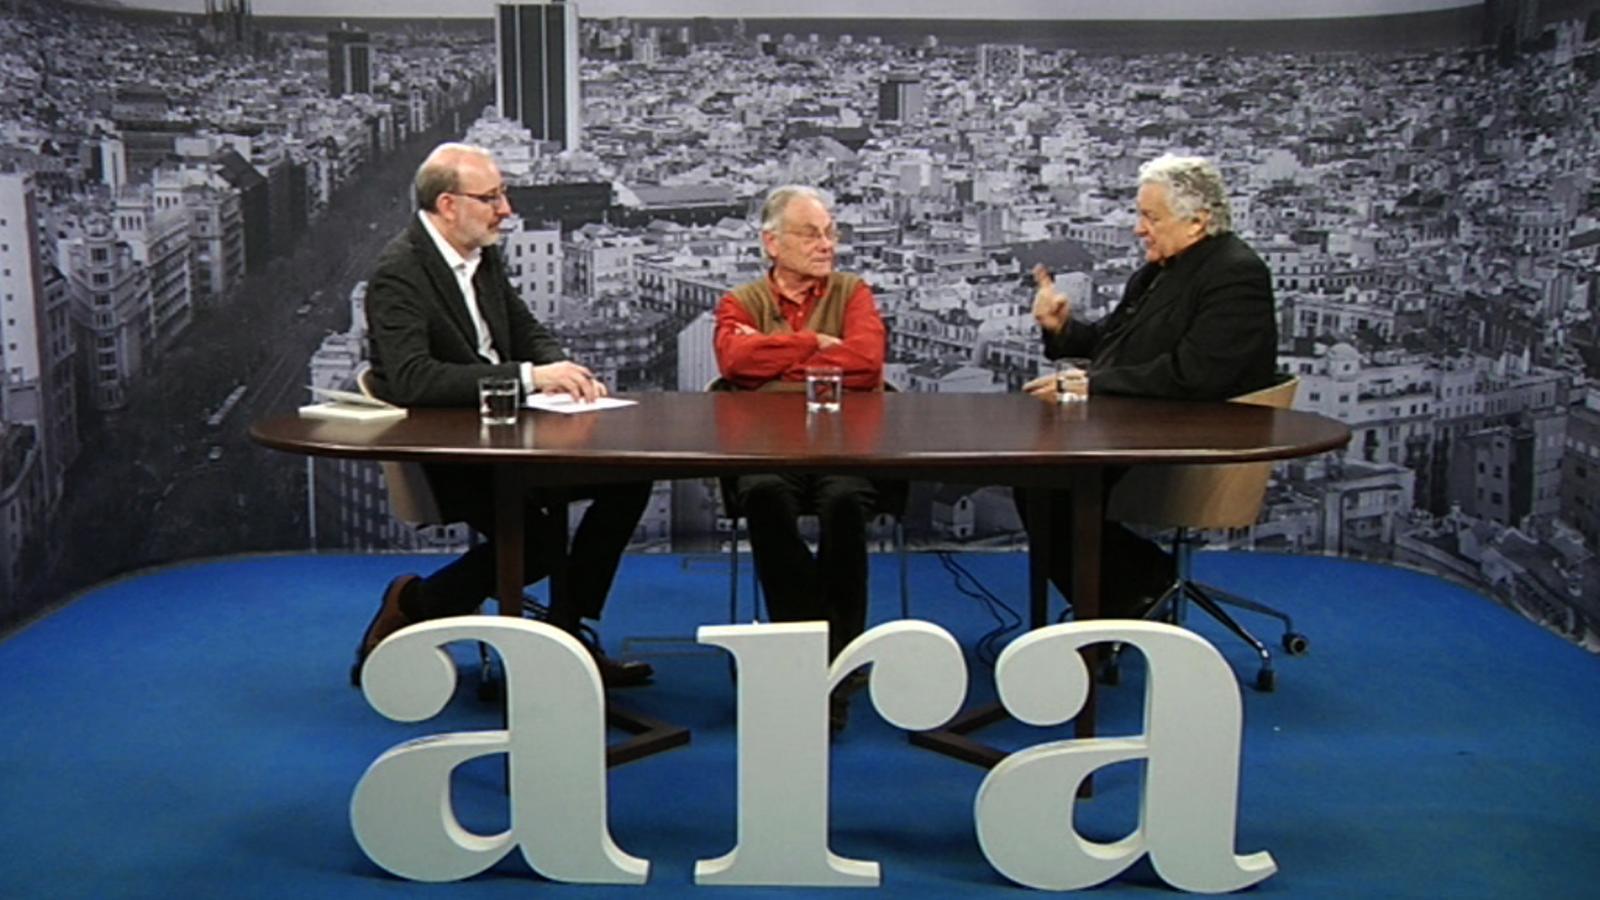 Entrevista d'Antoni Bassas a Joan Martínez Alier i Jorge Wagensberg